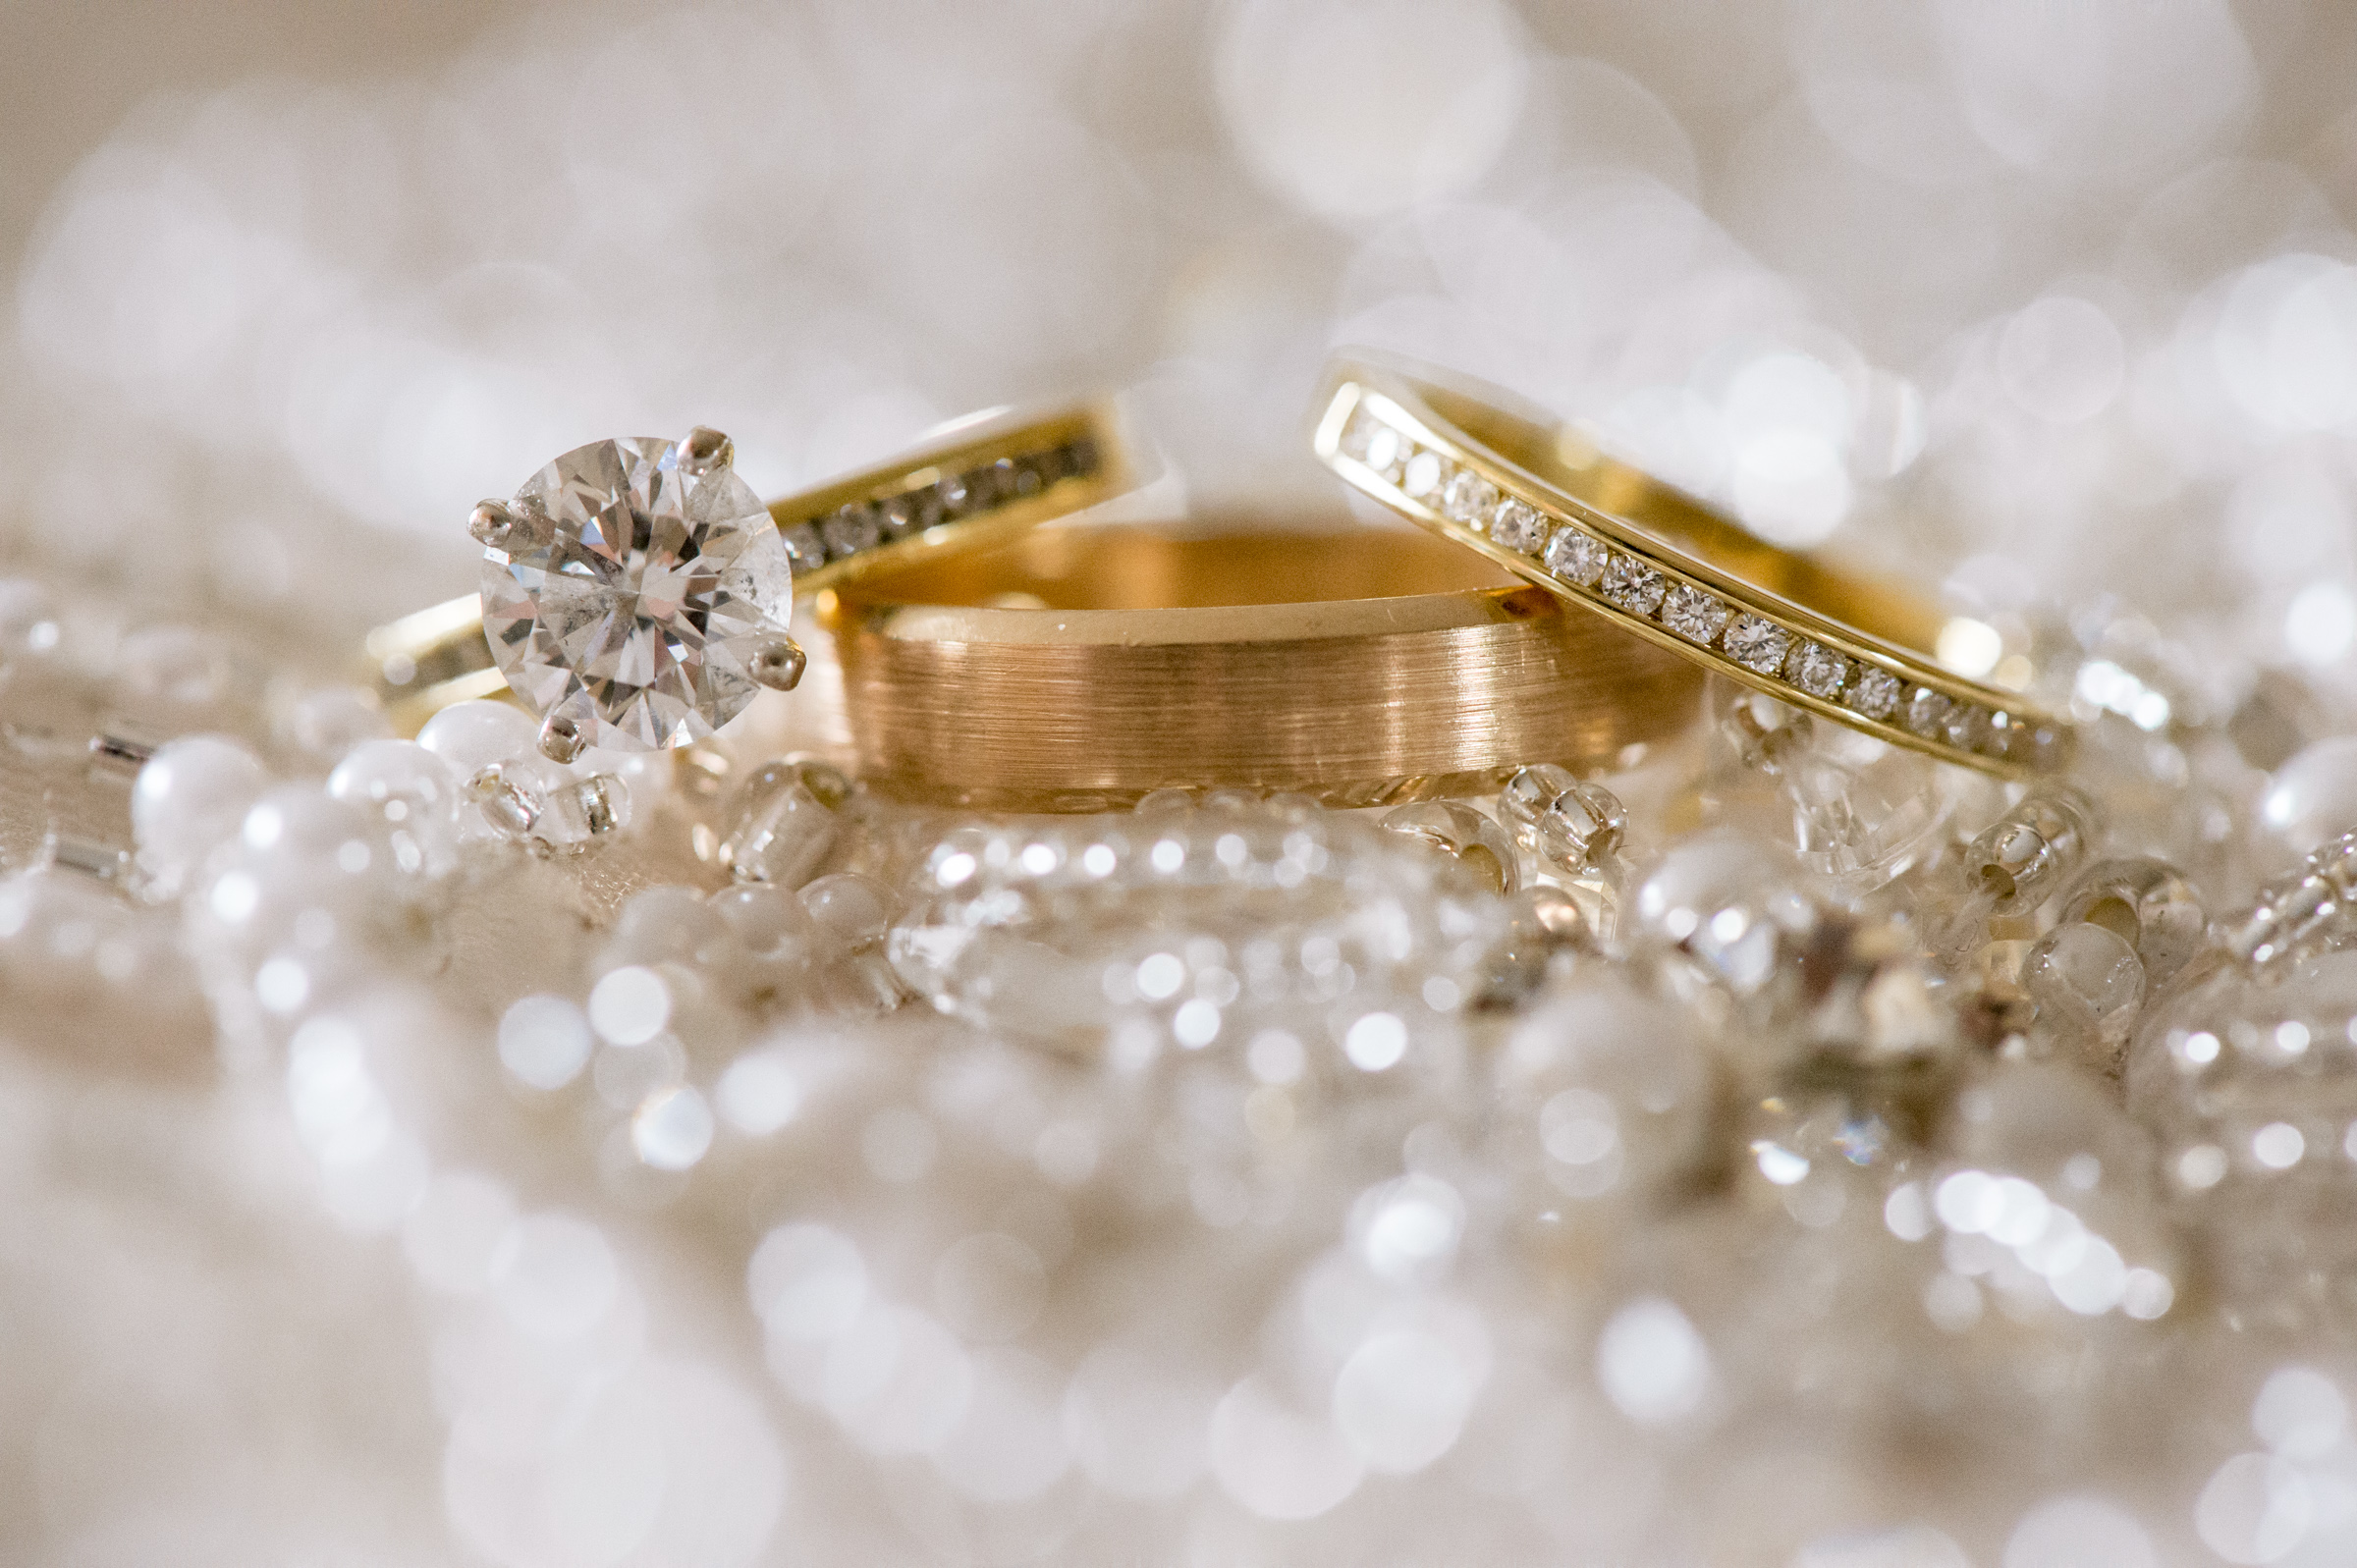 Stony Hill Inn Wedding Ring | New York Wedding Photographer